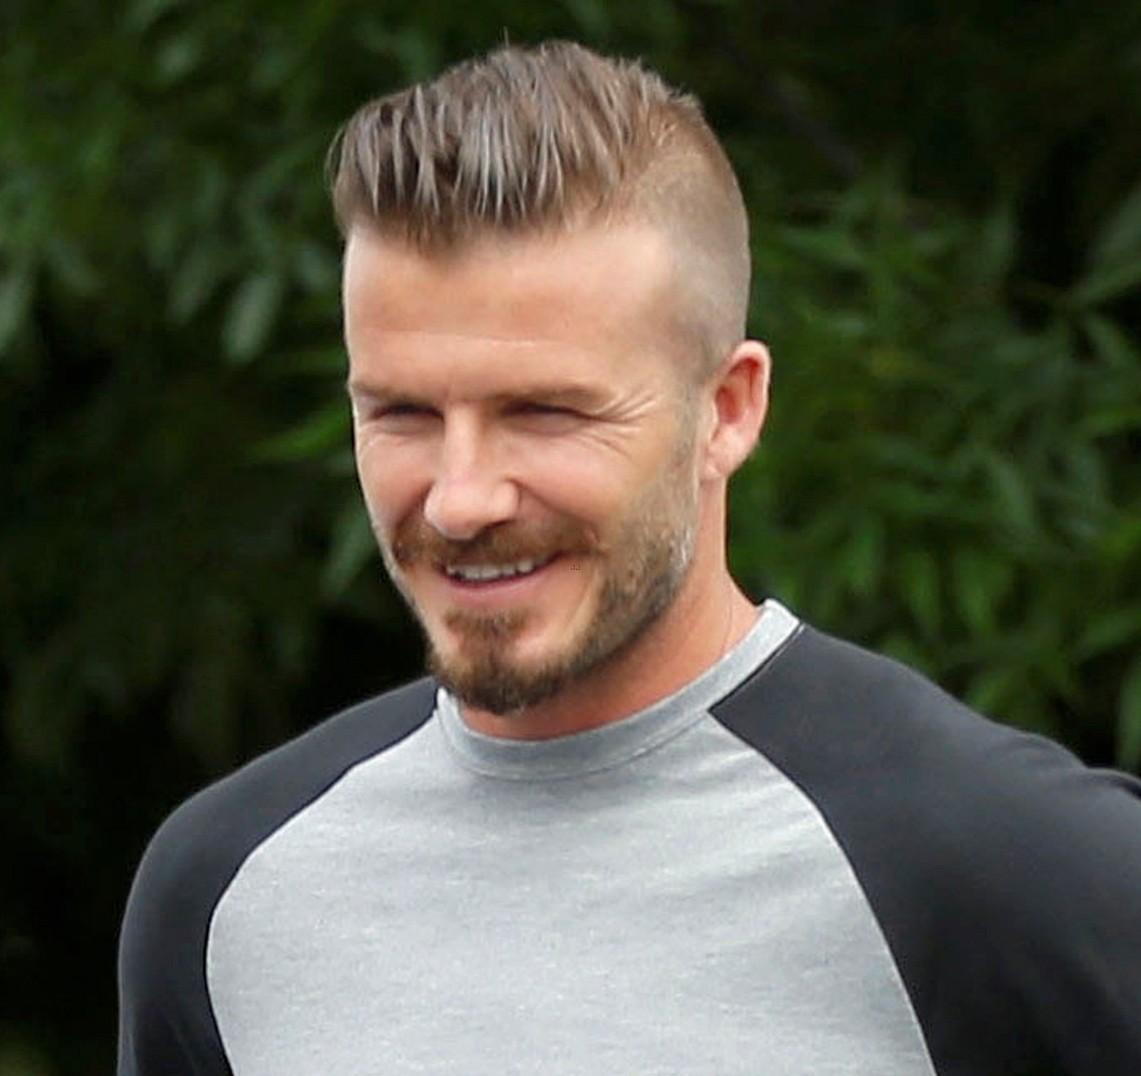 David Beckham Haircut 2013 Back out enough to slick back